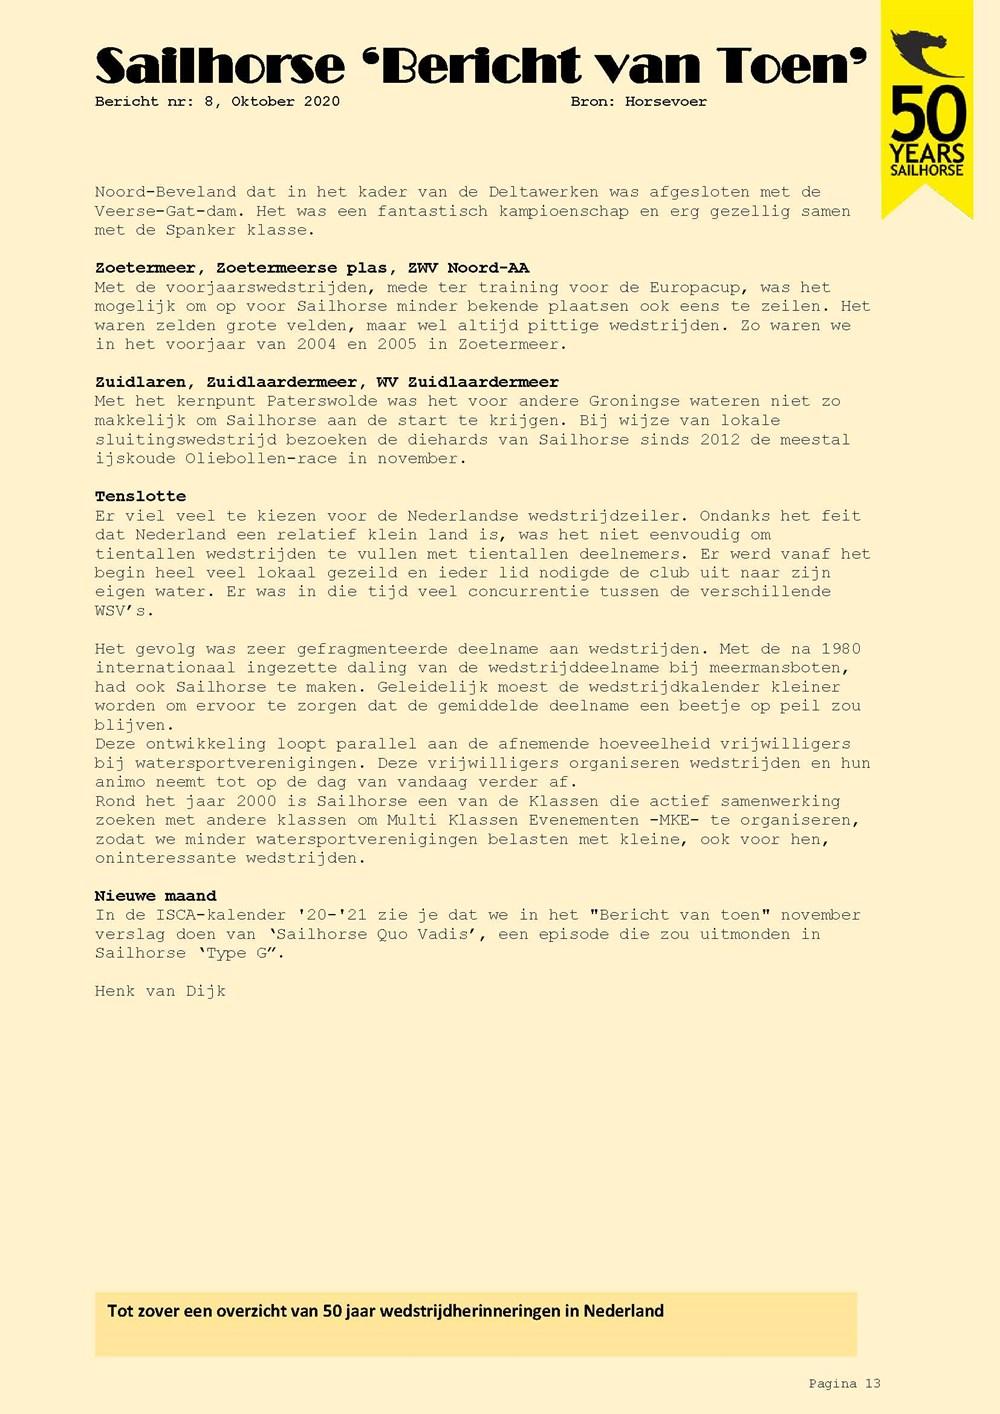 BvT8_Page_13.jpg